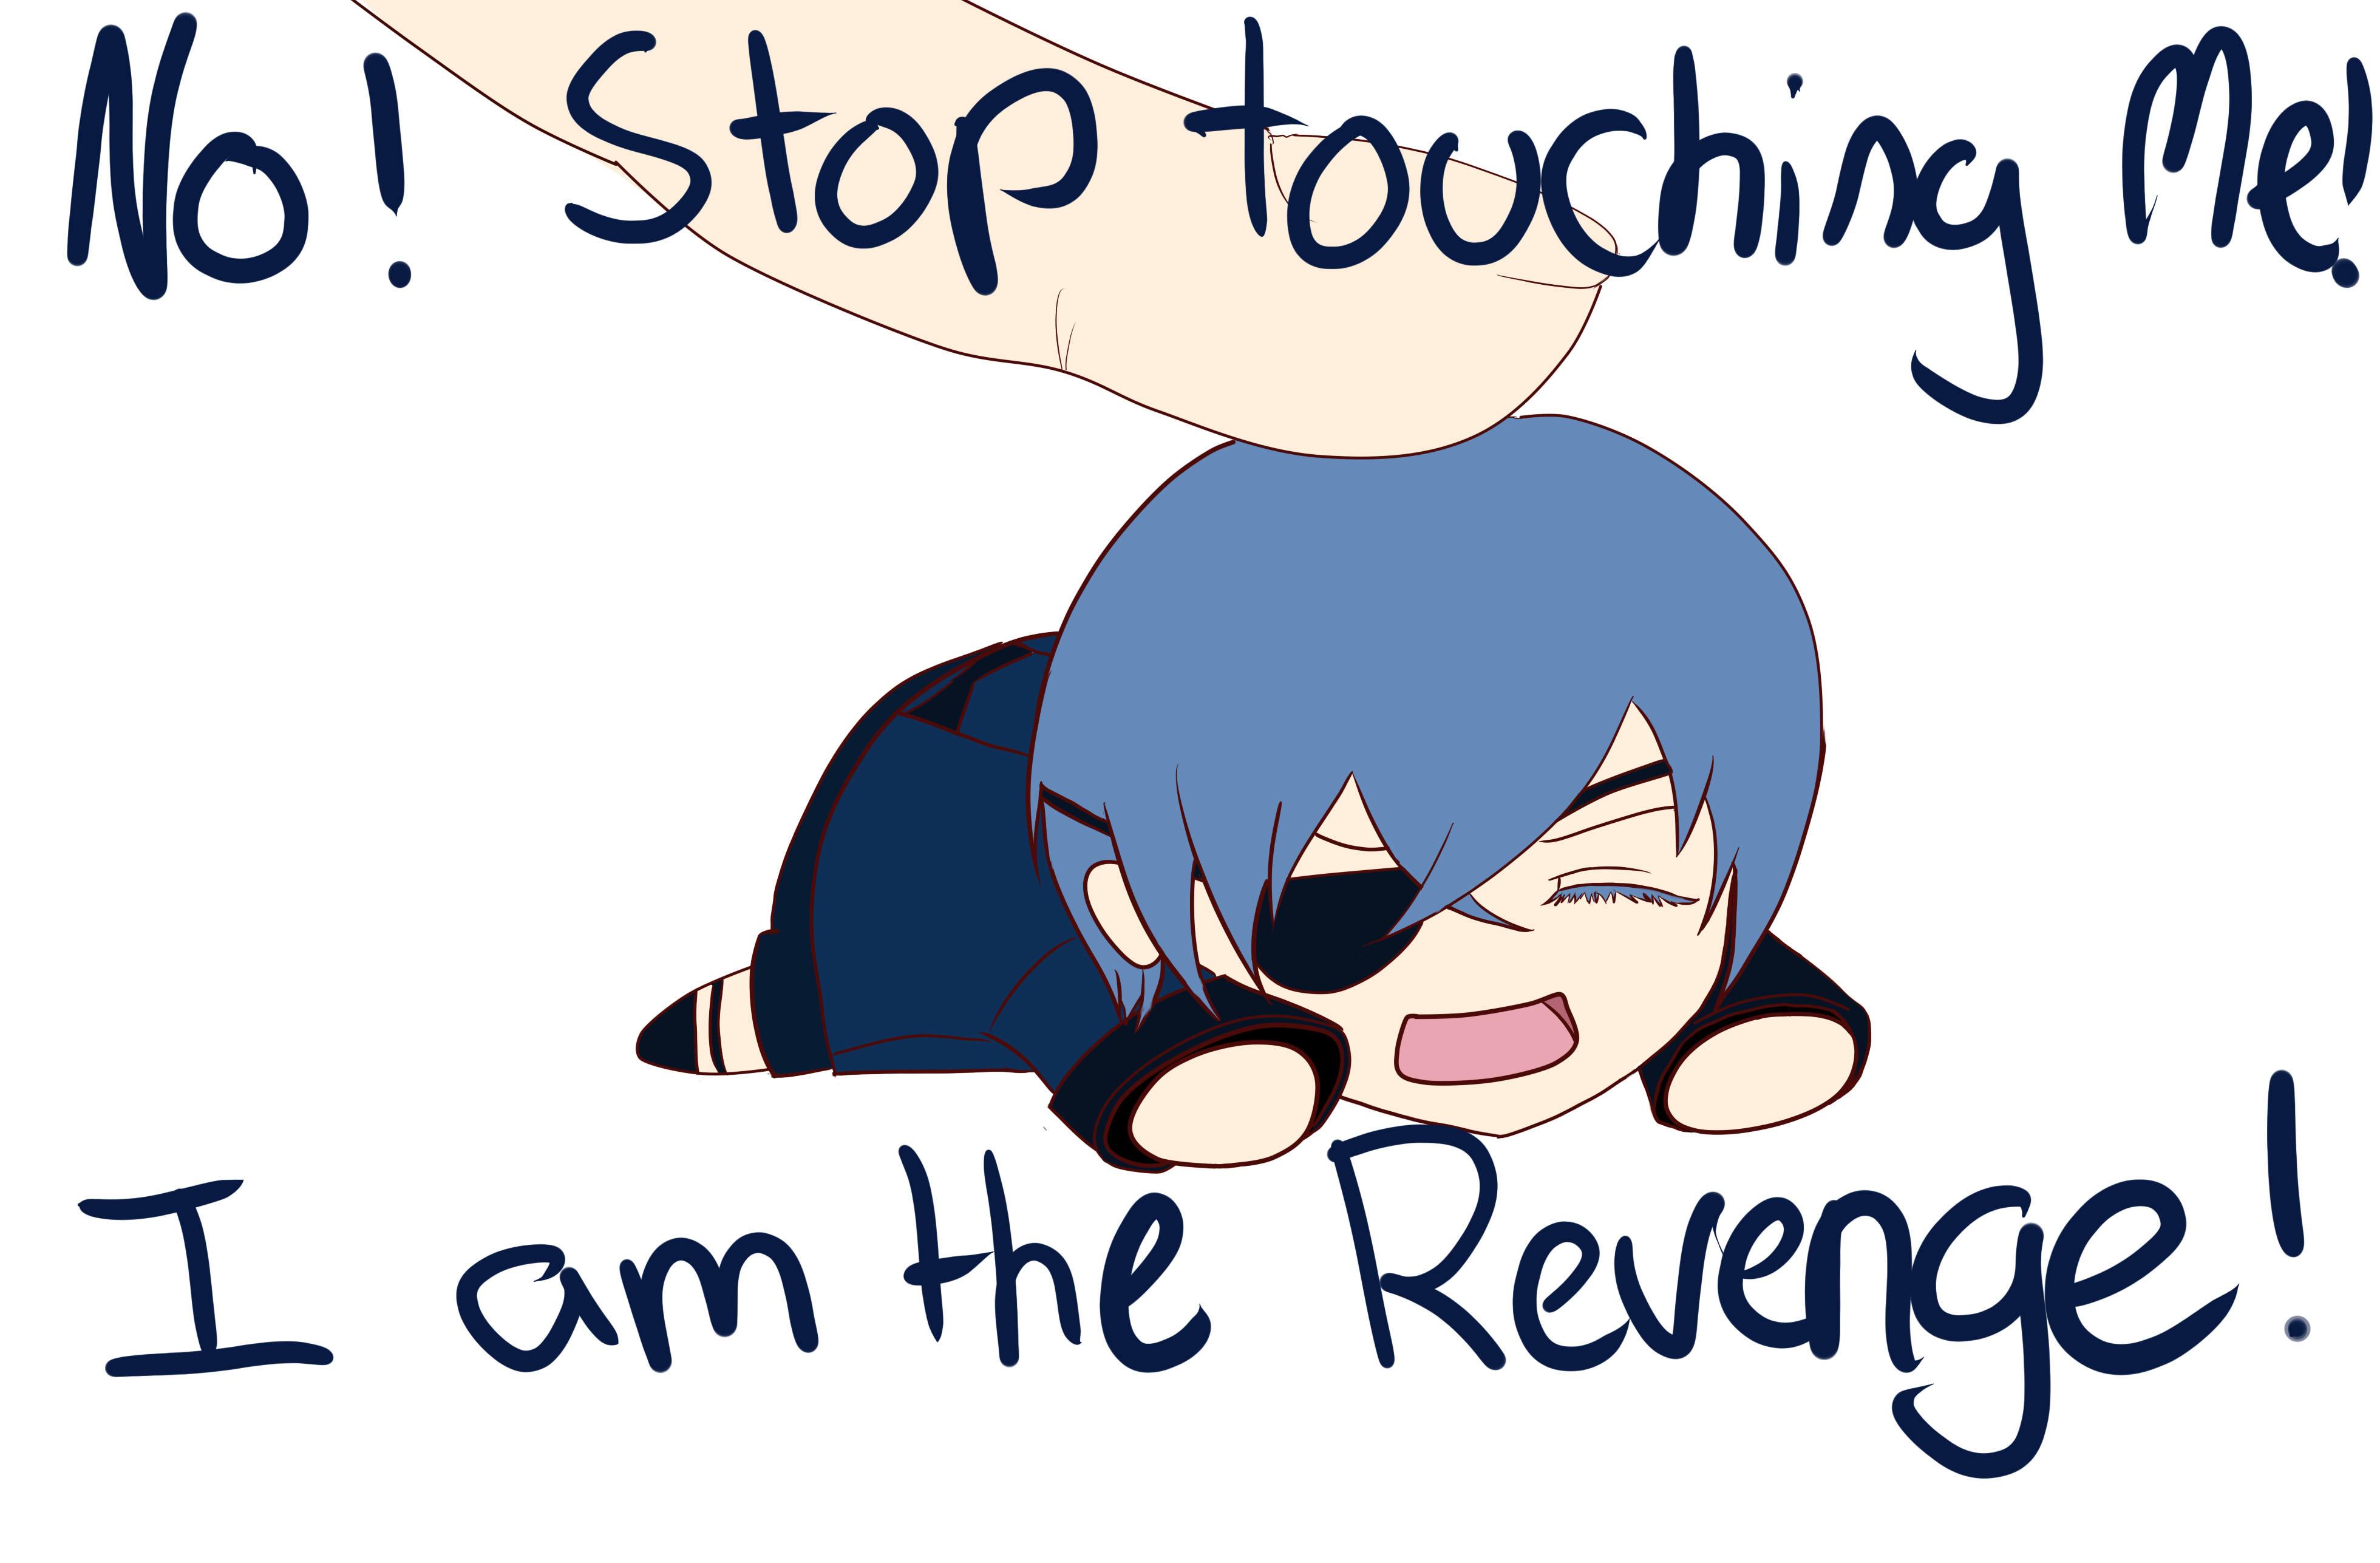 Ciel i am the revenge meme sticker